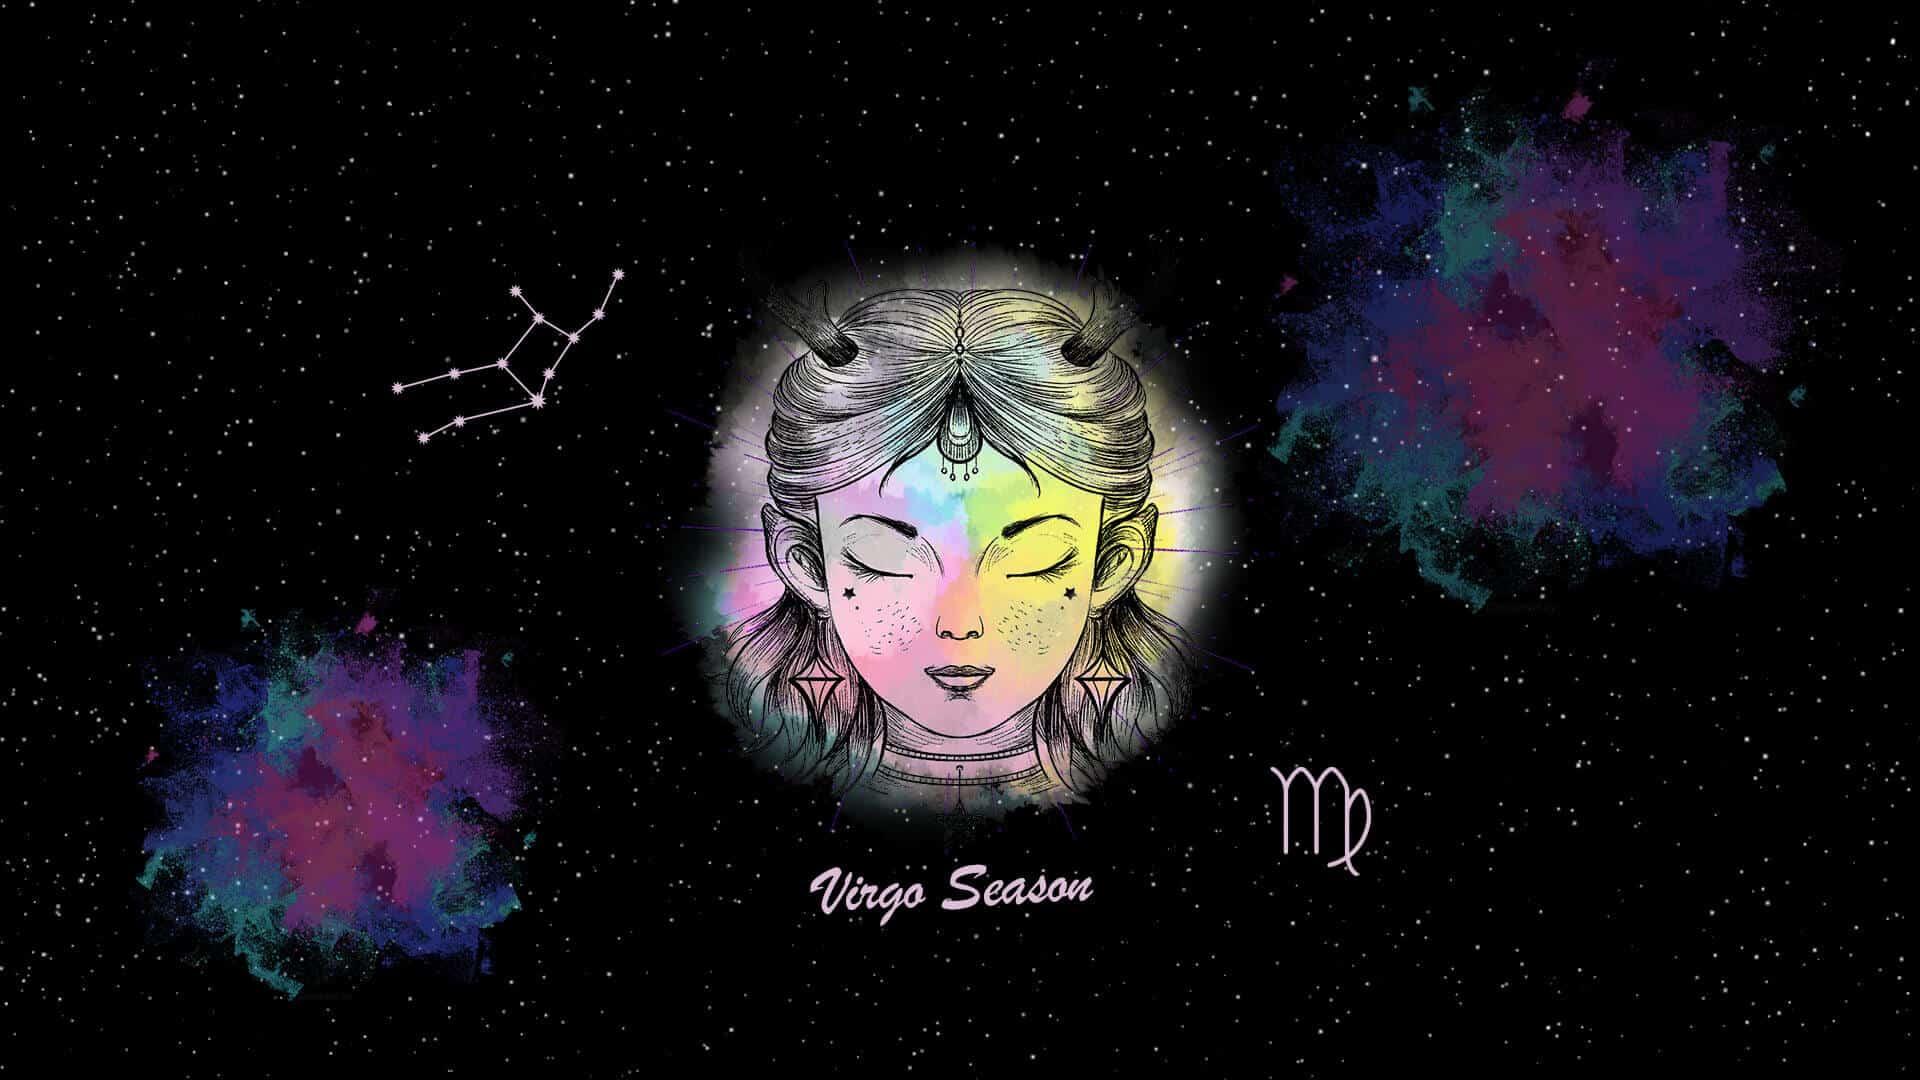 virgo season 2021 - Moon Omens